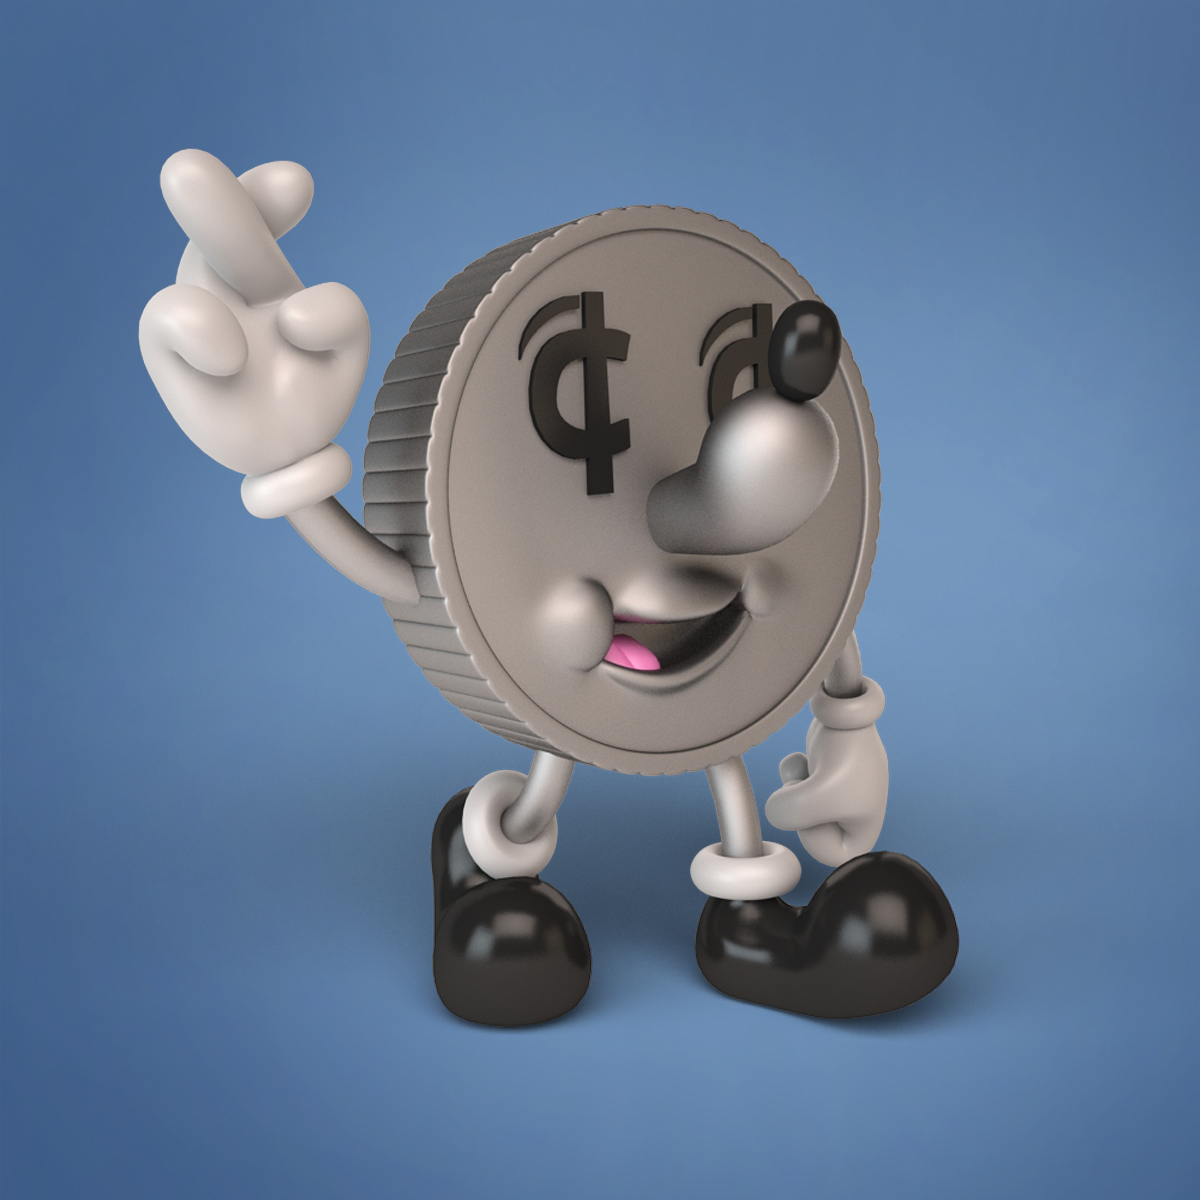 Jeremyville-lucky-dime-dollar-J_coin_02_o.jpg